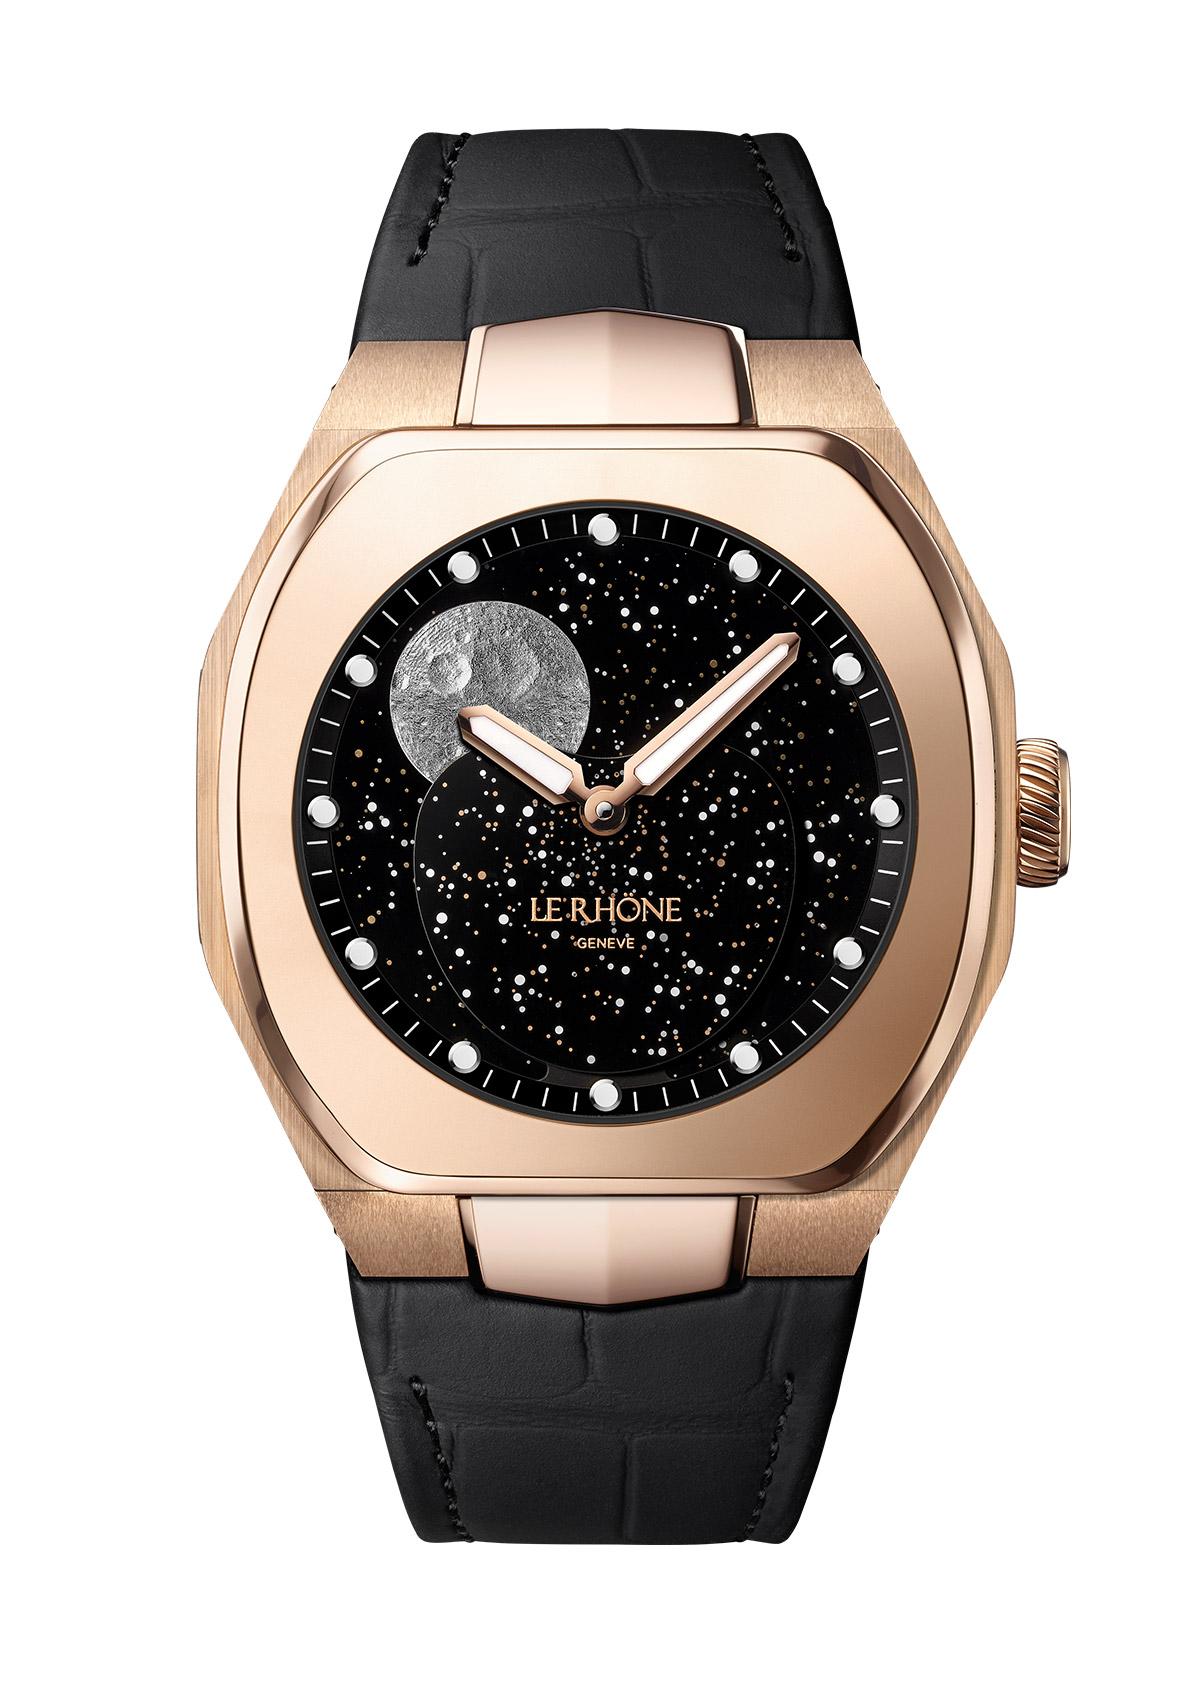 moon-41-le-rhone-watch-H3PG091-1-A99D